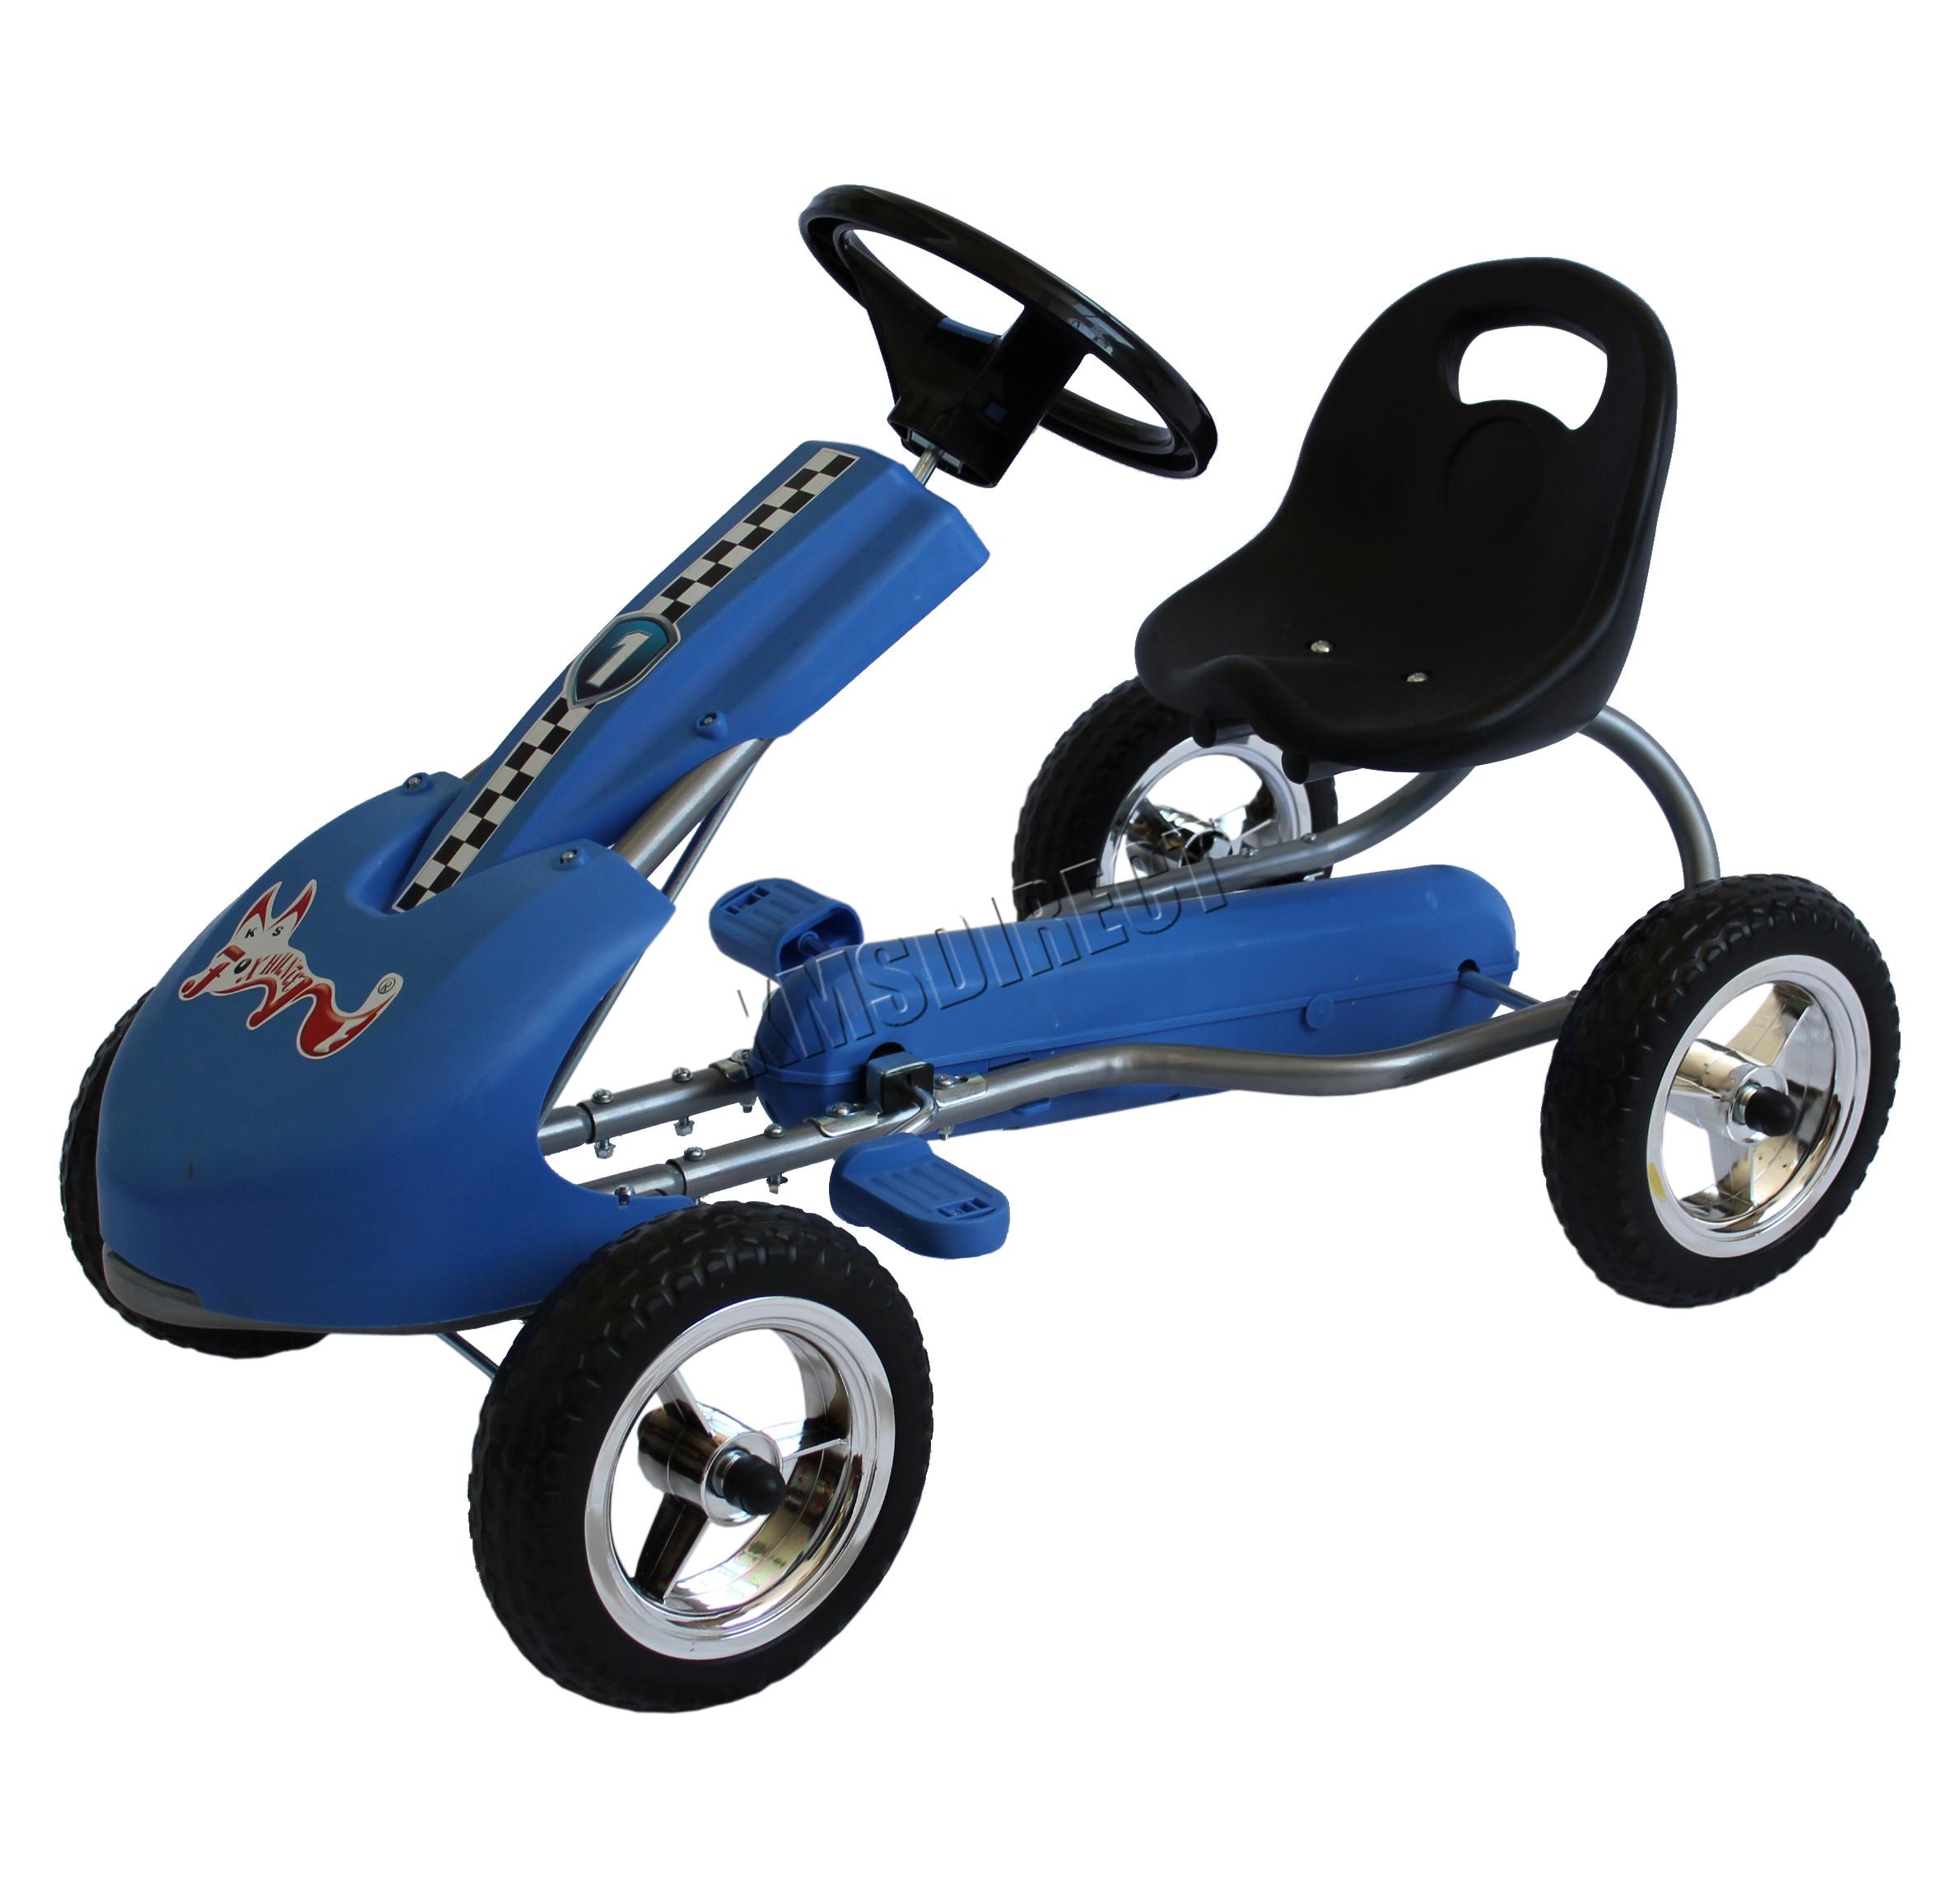 foxhunter kids go kart ride on car with pedal plastic wheels adjustable seat new ebay. Black Bedroom Furniture Sets. Home Design Ideas